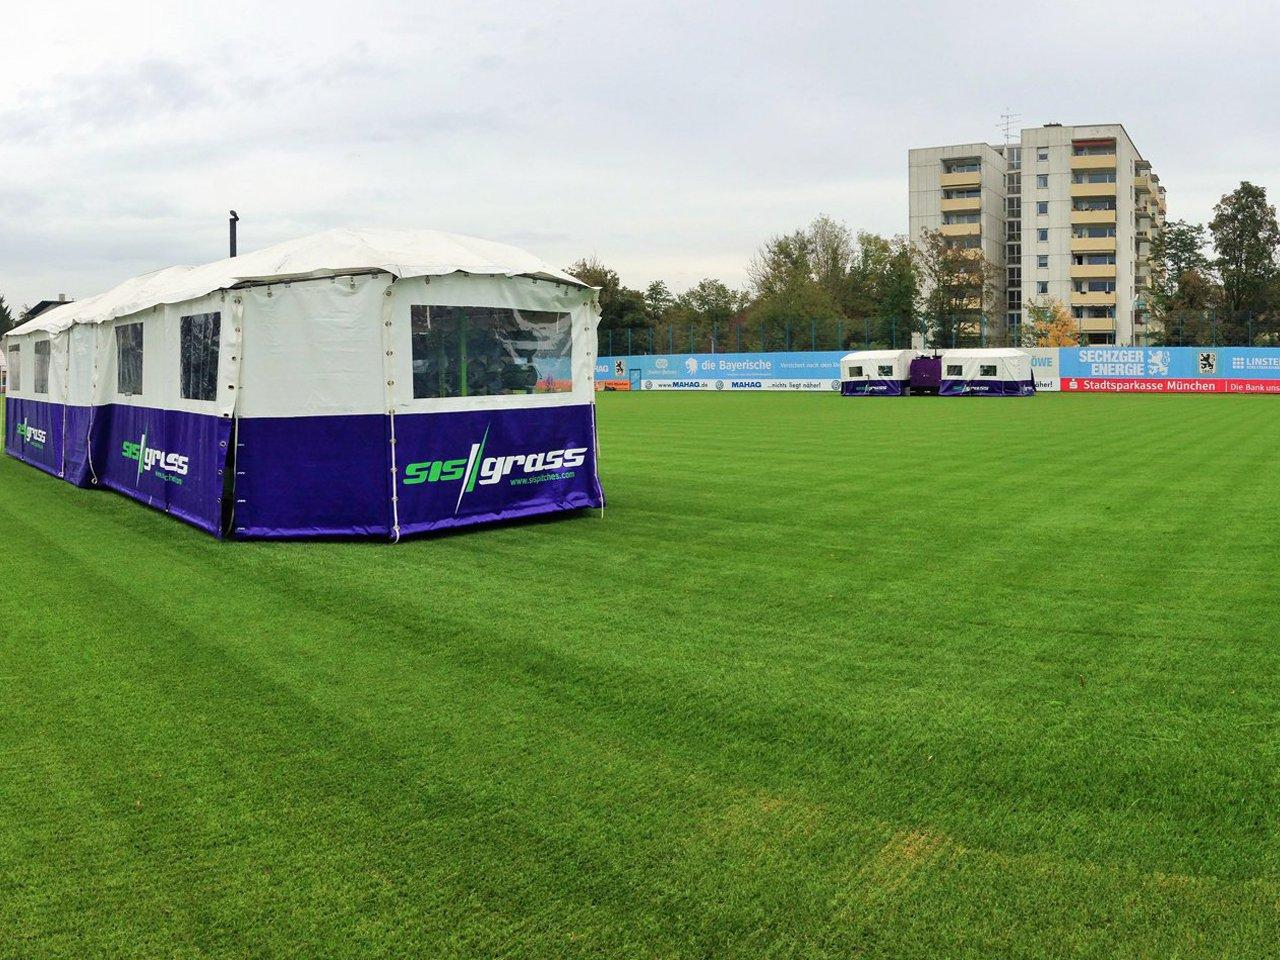 SIS Grass TSV 1860 München